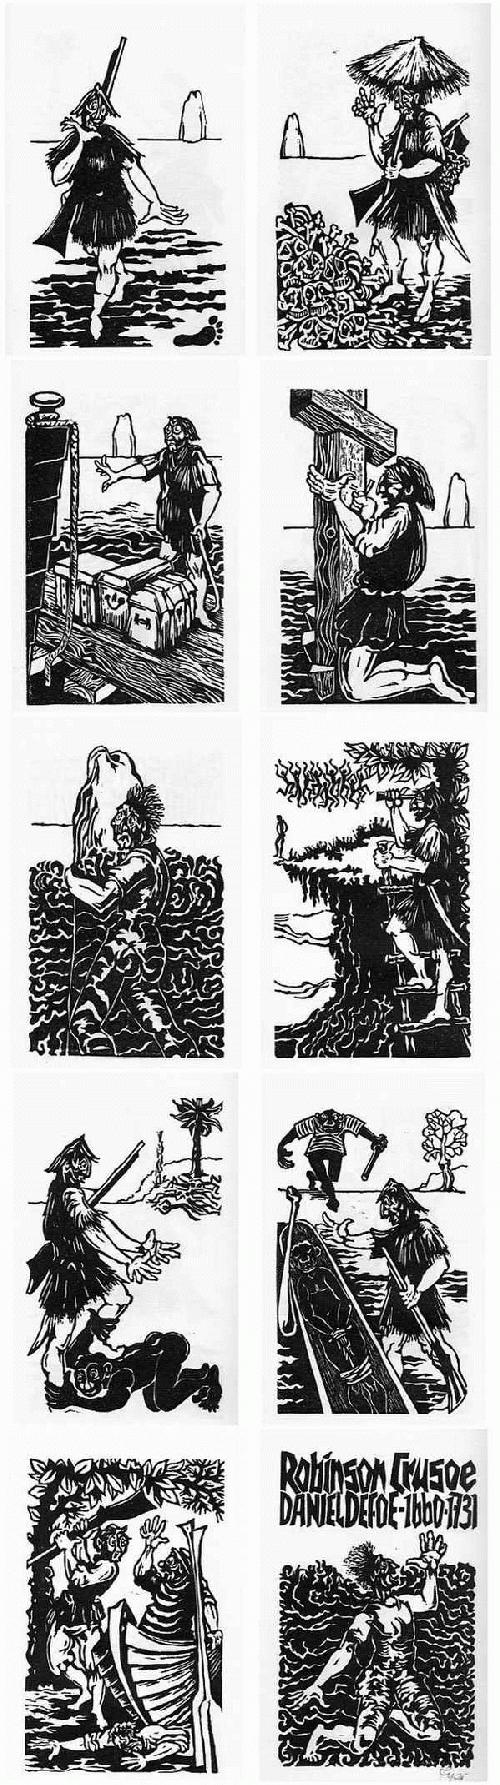 Hermet Ripè - ROBINSON CRUSOE - 10 OriginalLinolschnitte des Peter KOWALSKI-Schülers a.BRESLAU - handsigniert 1977 kopen? Bied vanaf 32!